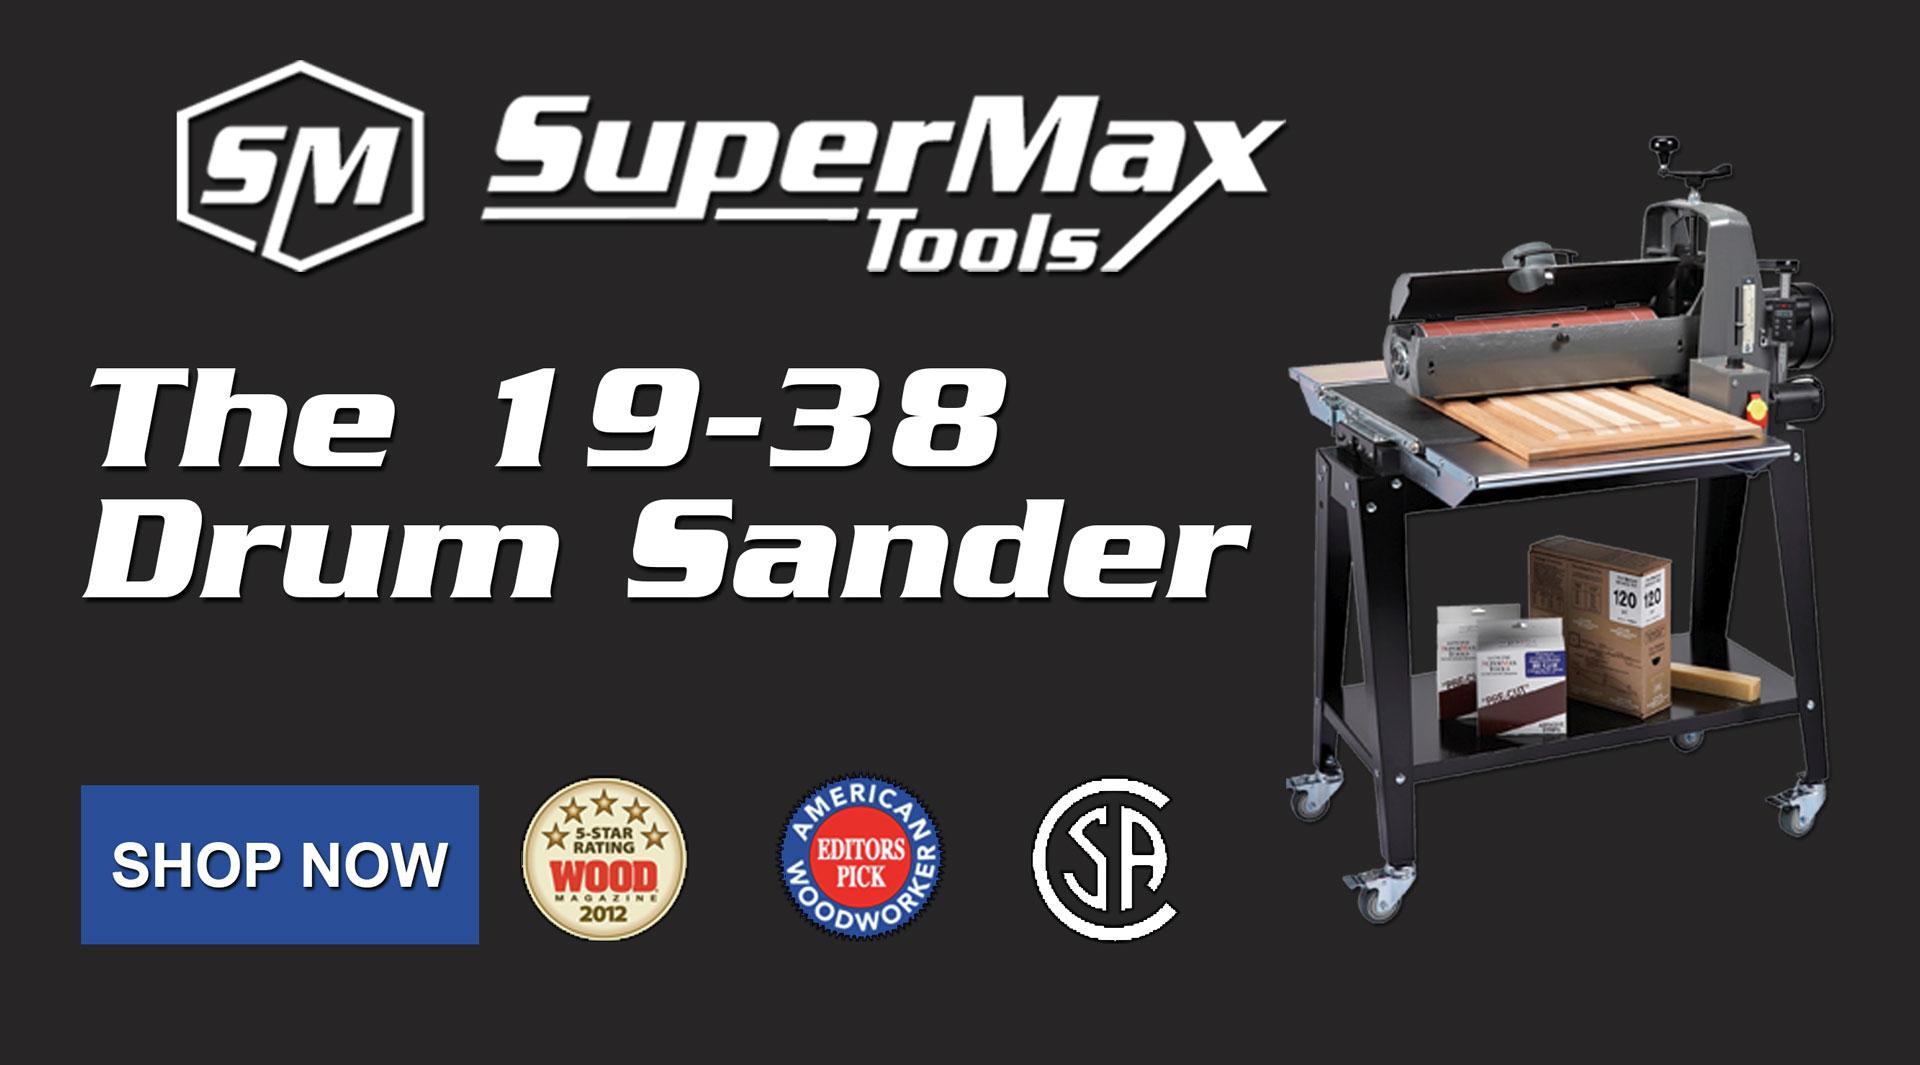 The 19-38 Drum Sander